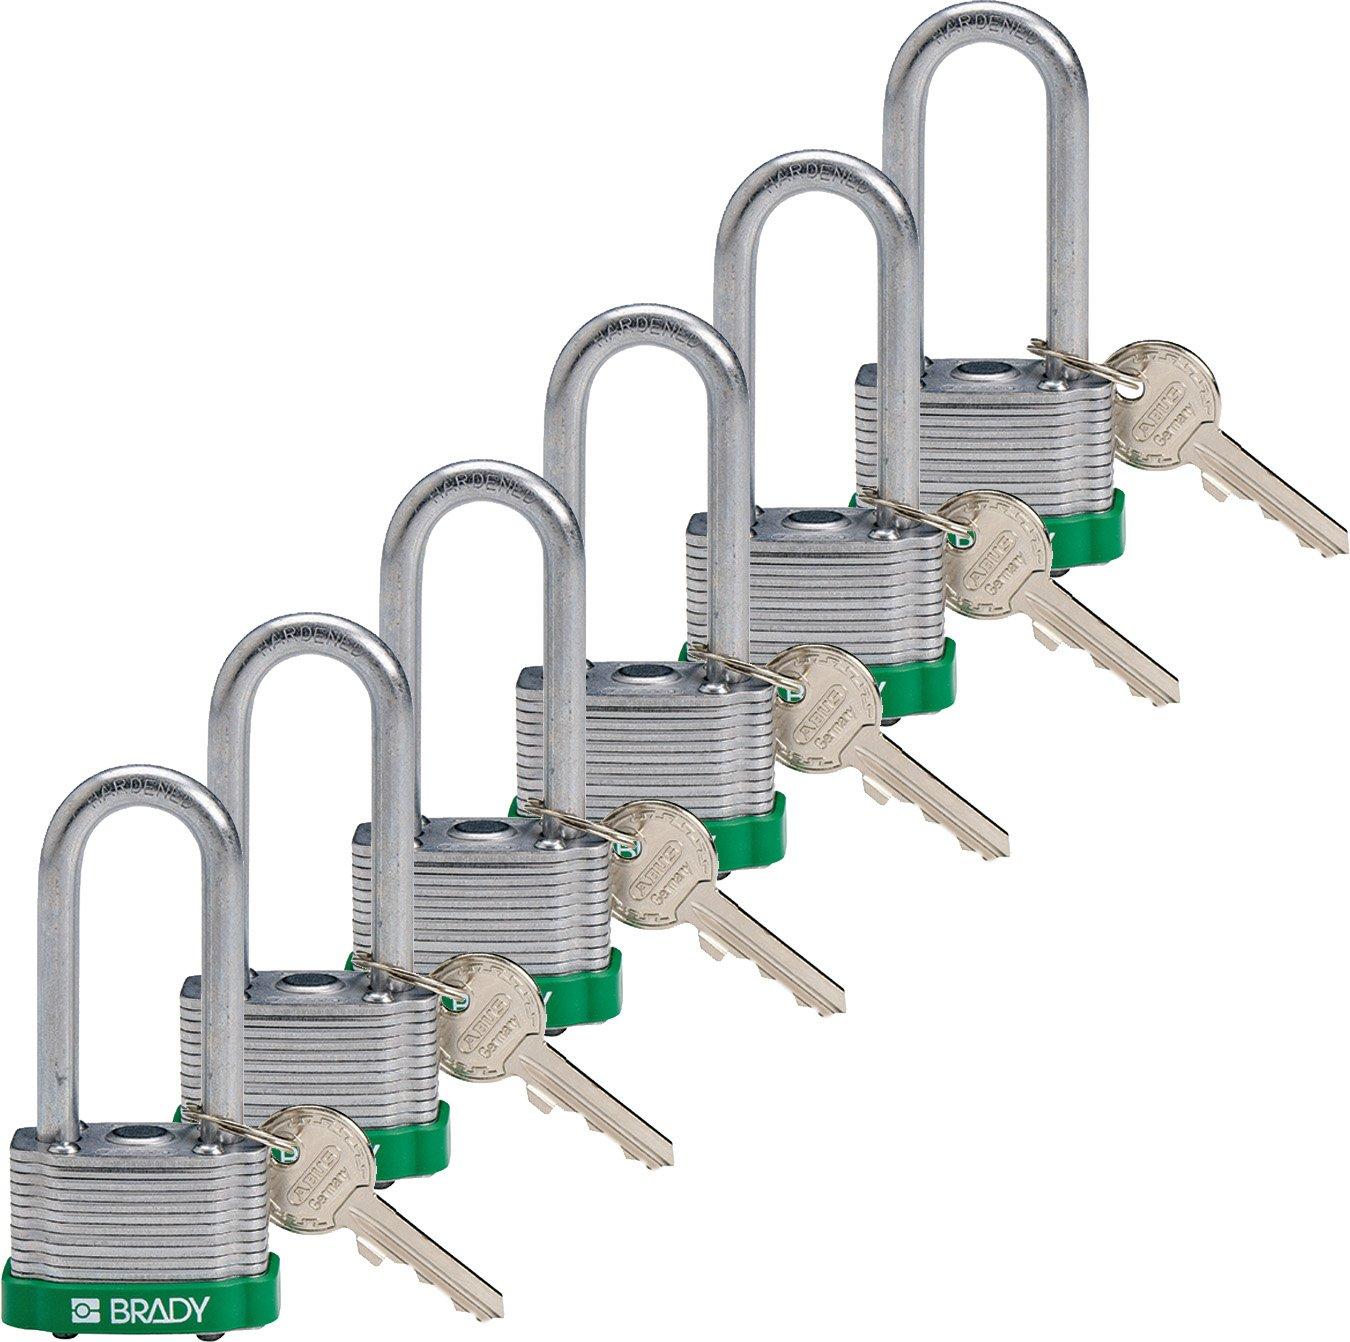 Brady 118976 Green, Key Retaining Steel PadLock - 2'' Shackle - Keyed Alike (6 Locks)